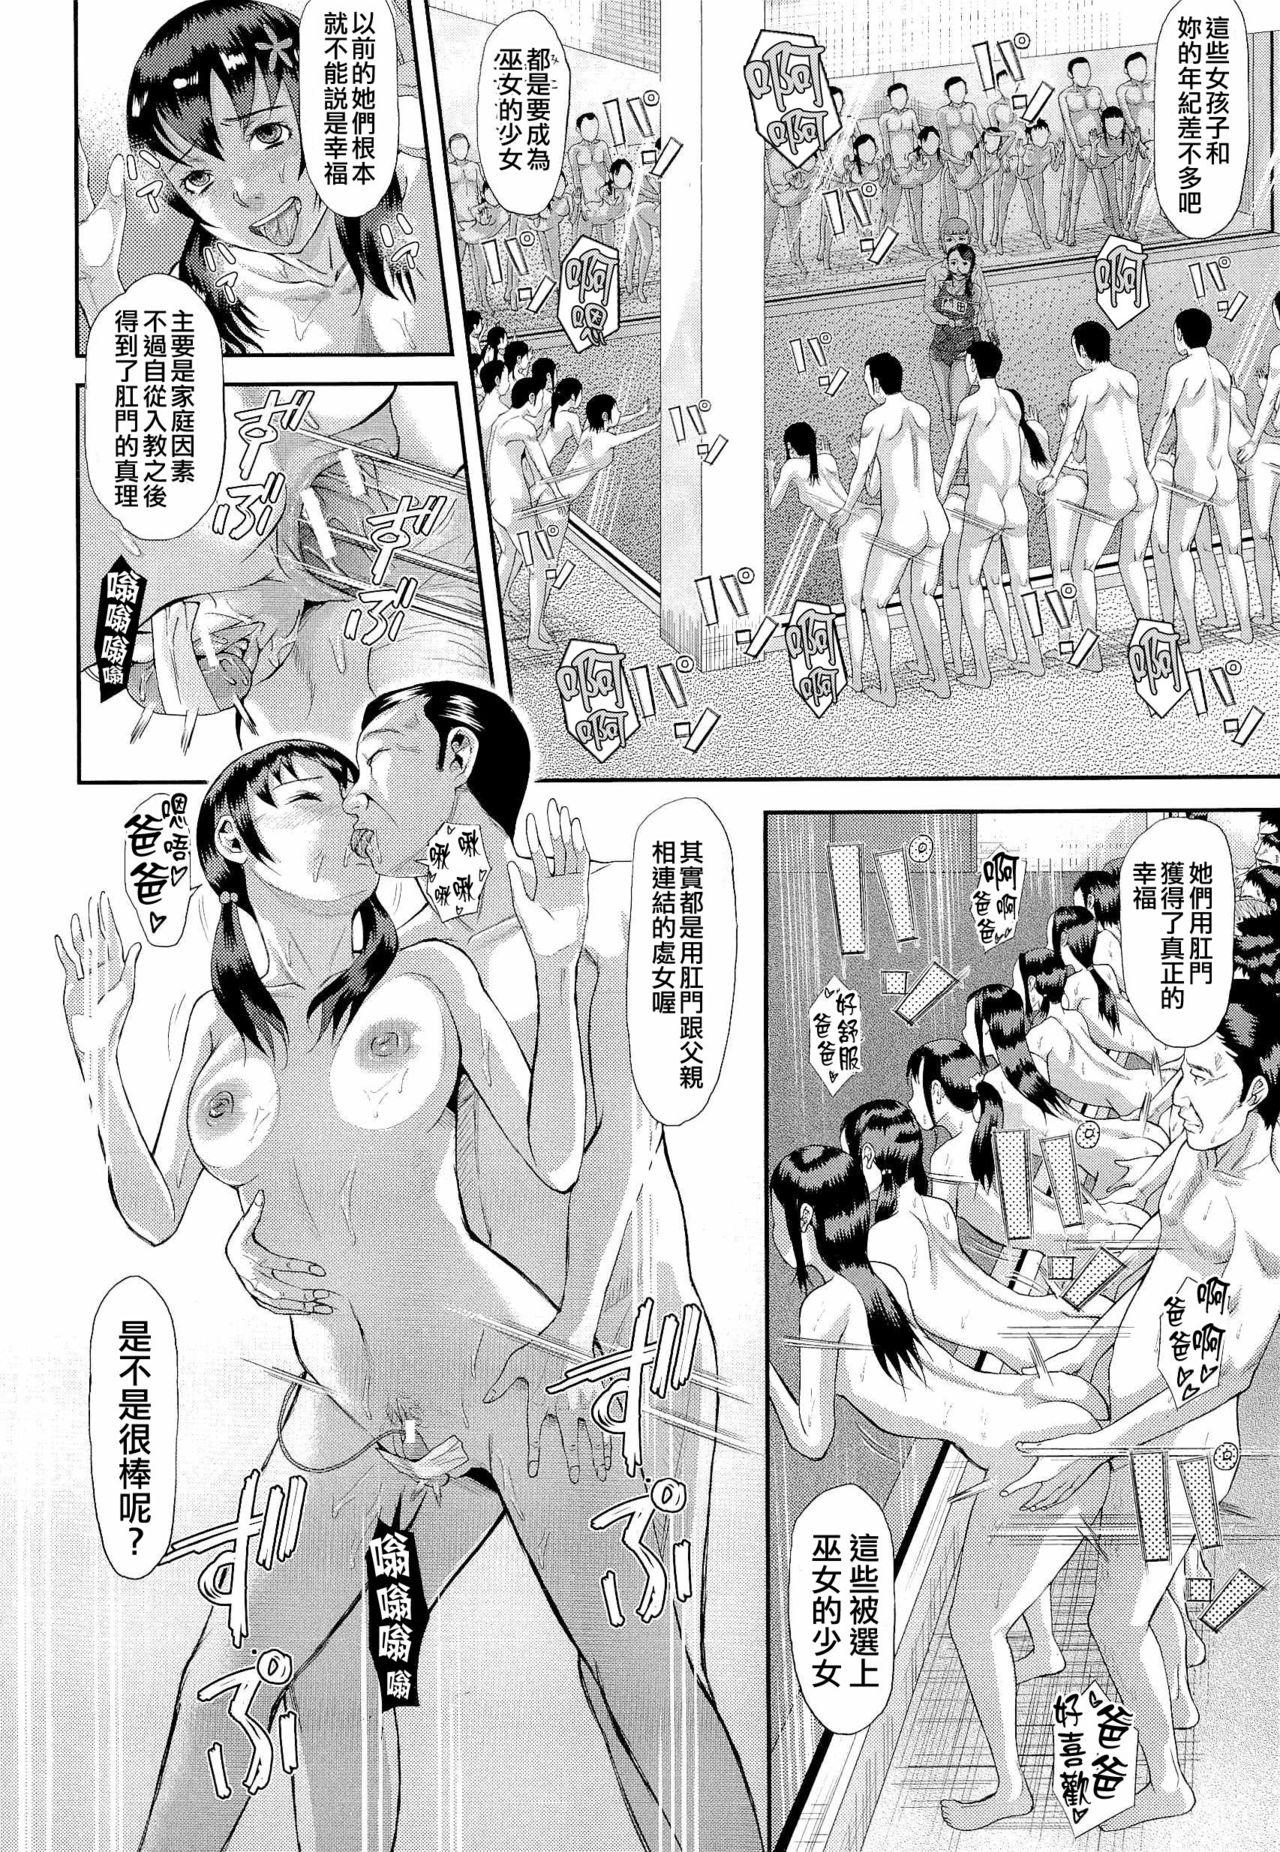 [Honebuto Danshaku] Innou Kaizou Program ~Oyako Zecchou Cult Ochi~ [Chinese]【不想记名重嵌--高质量图源】 72